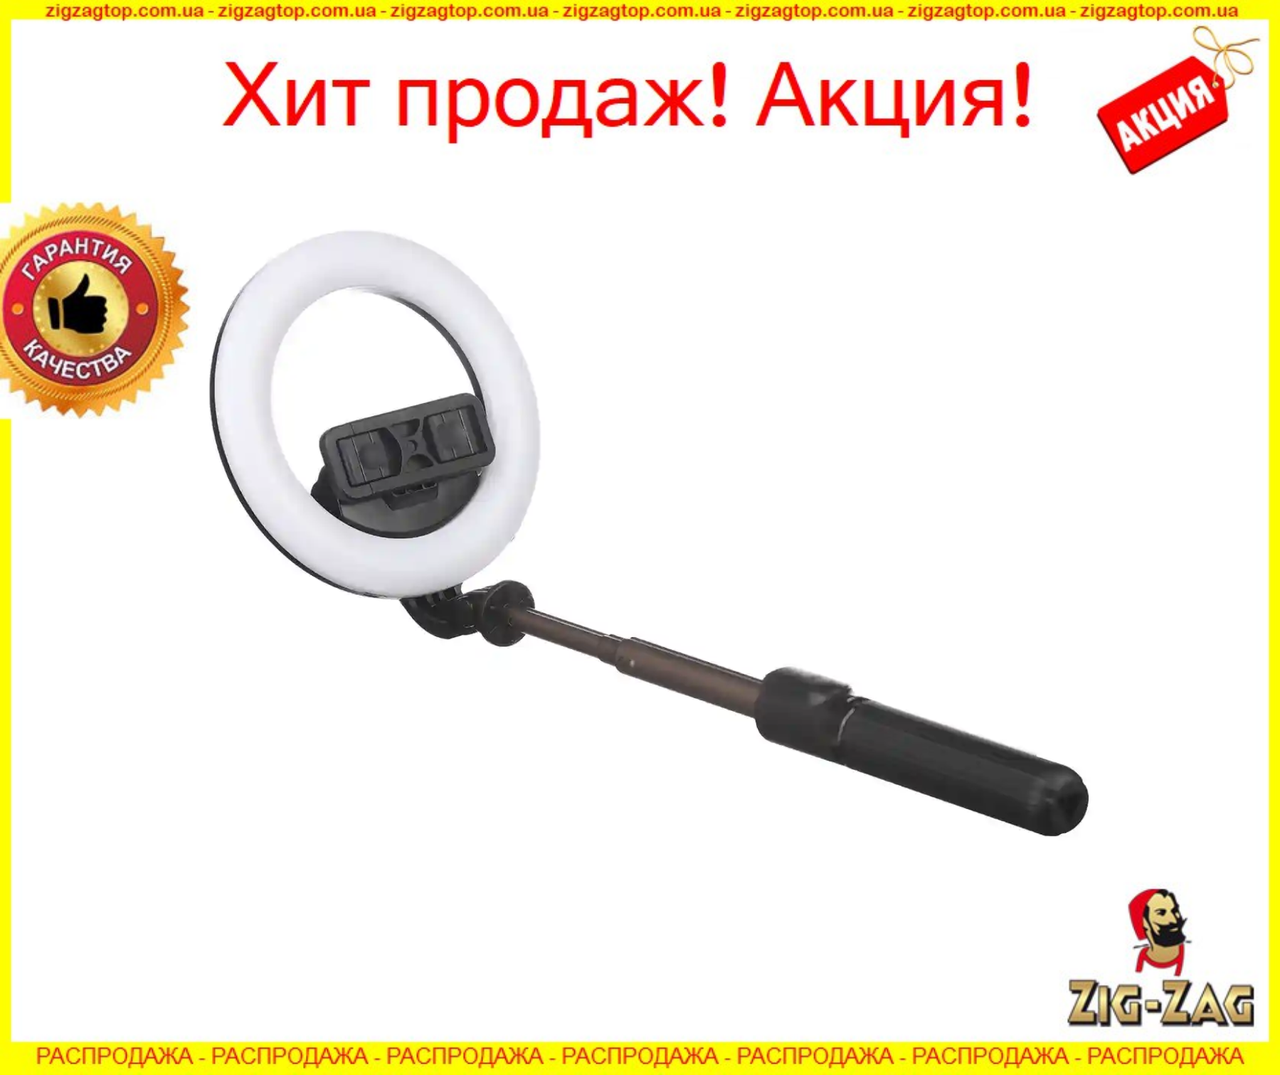 Кольцевая лампа Selfie Stick 16 диаметр для Телефона на Триноге L07 7332 селфи с Пультом Tripod на Штативе